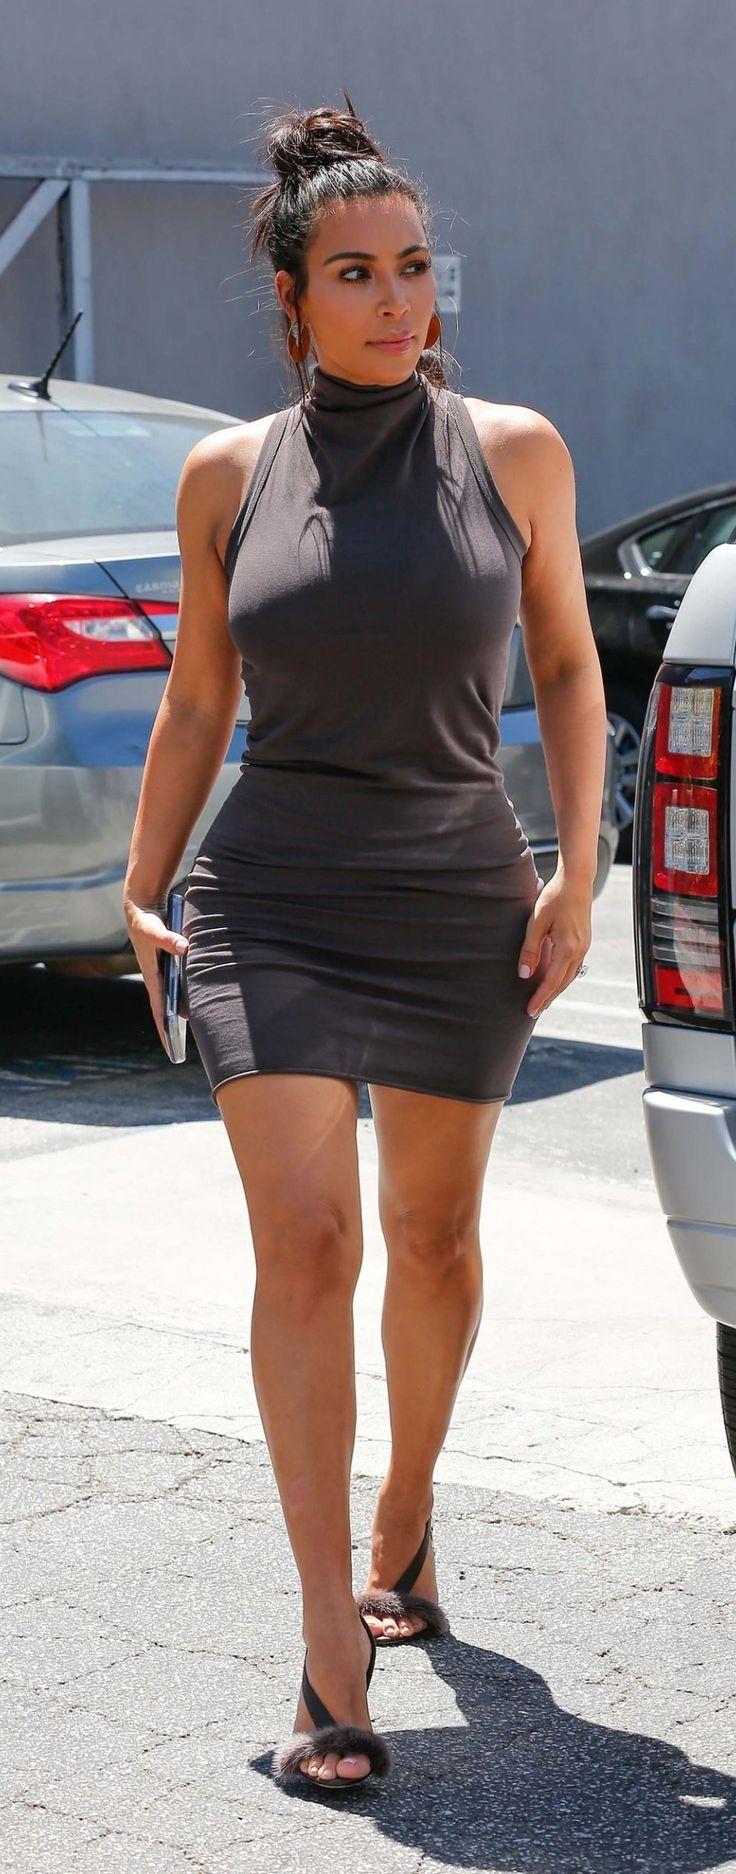 Kim Kardashian West in a body-con mini-dress and fur-trimmed heels from Olgana Paris.